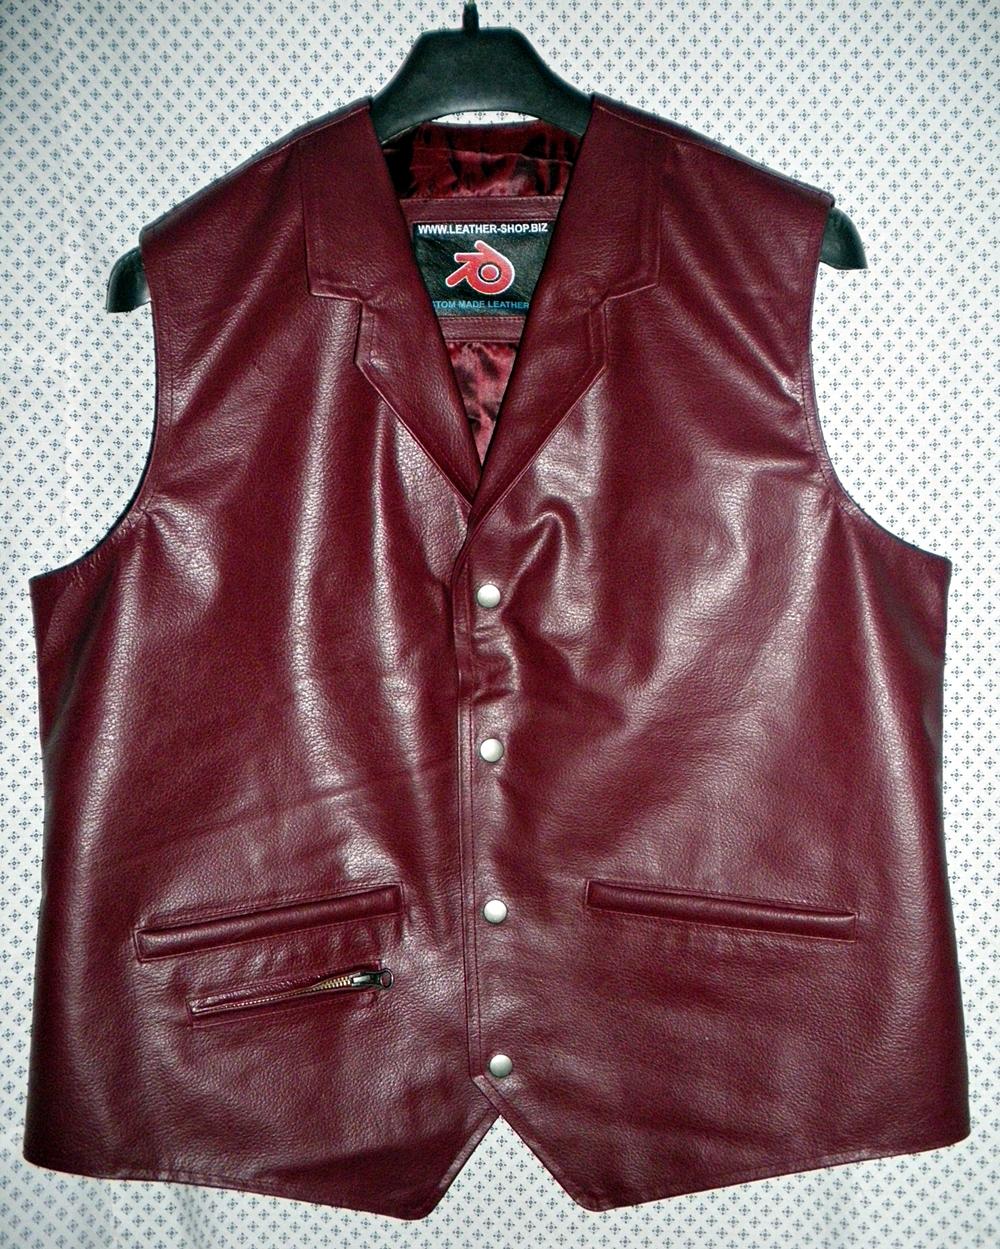 mens-western-style-leather-vest-mlv86-www.leather-shop.biz-front-pic.jpg